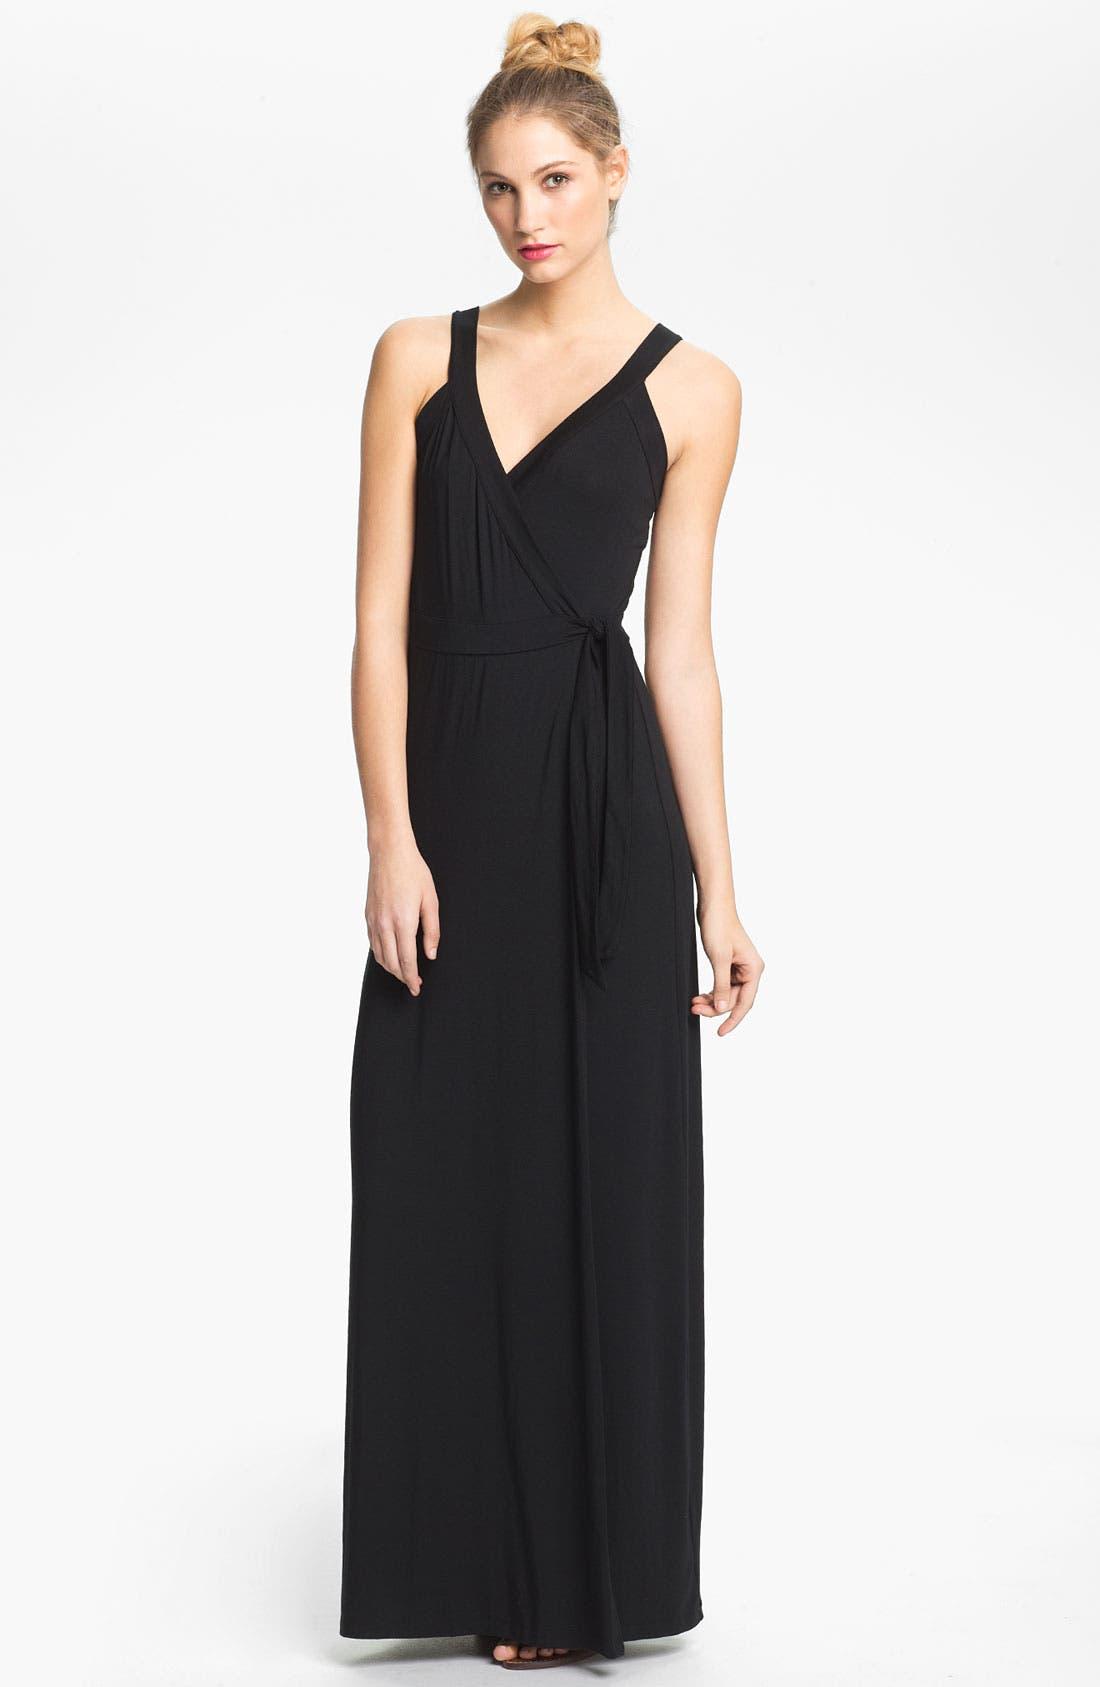 Alternate Image 1 Selected - Tart 'Camille' Sleeveless Jersey Wrap Maxi Dress